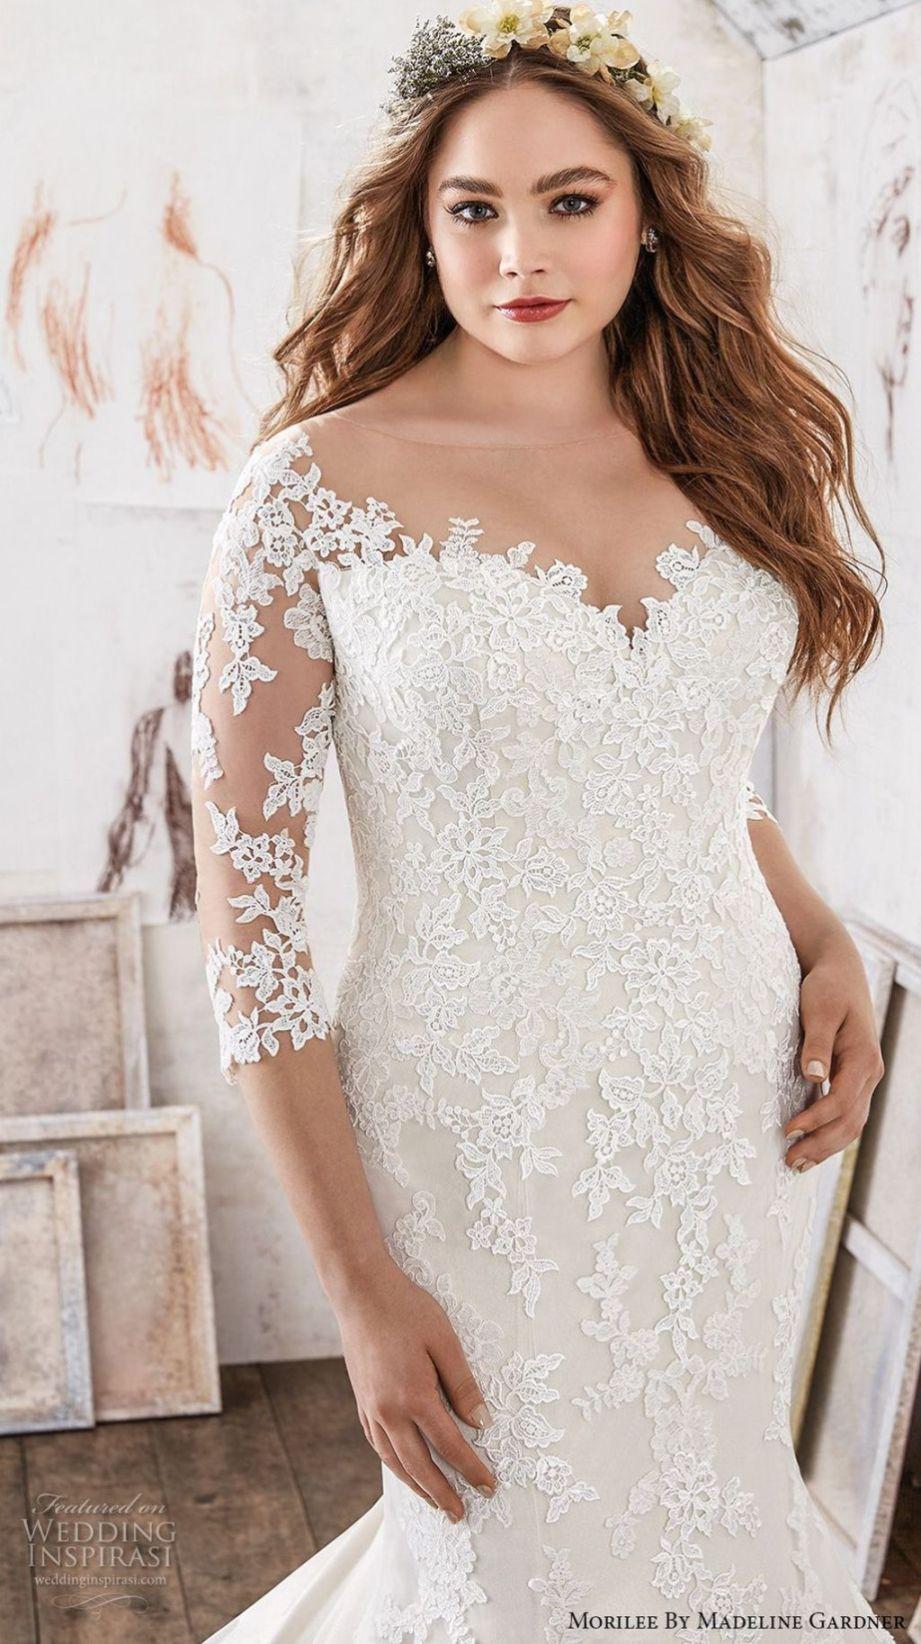 Cute plus size mermaid wedding dresses ideas cameron